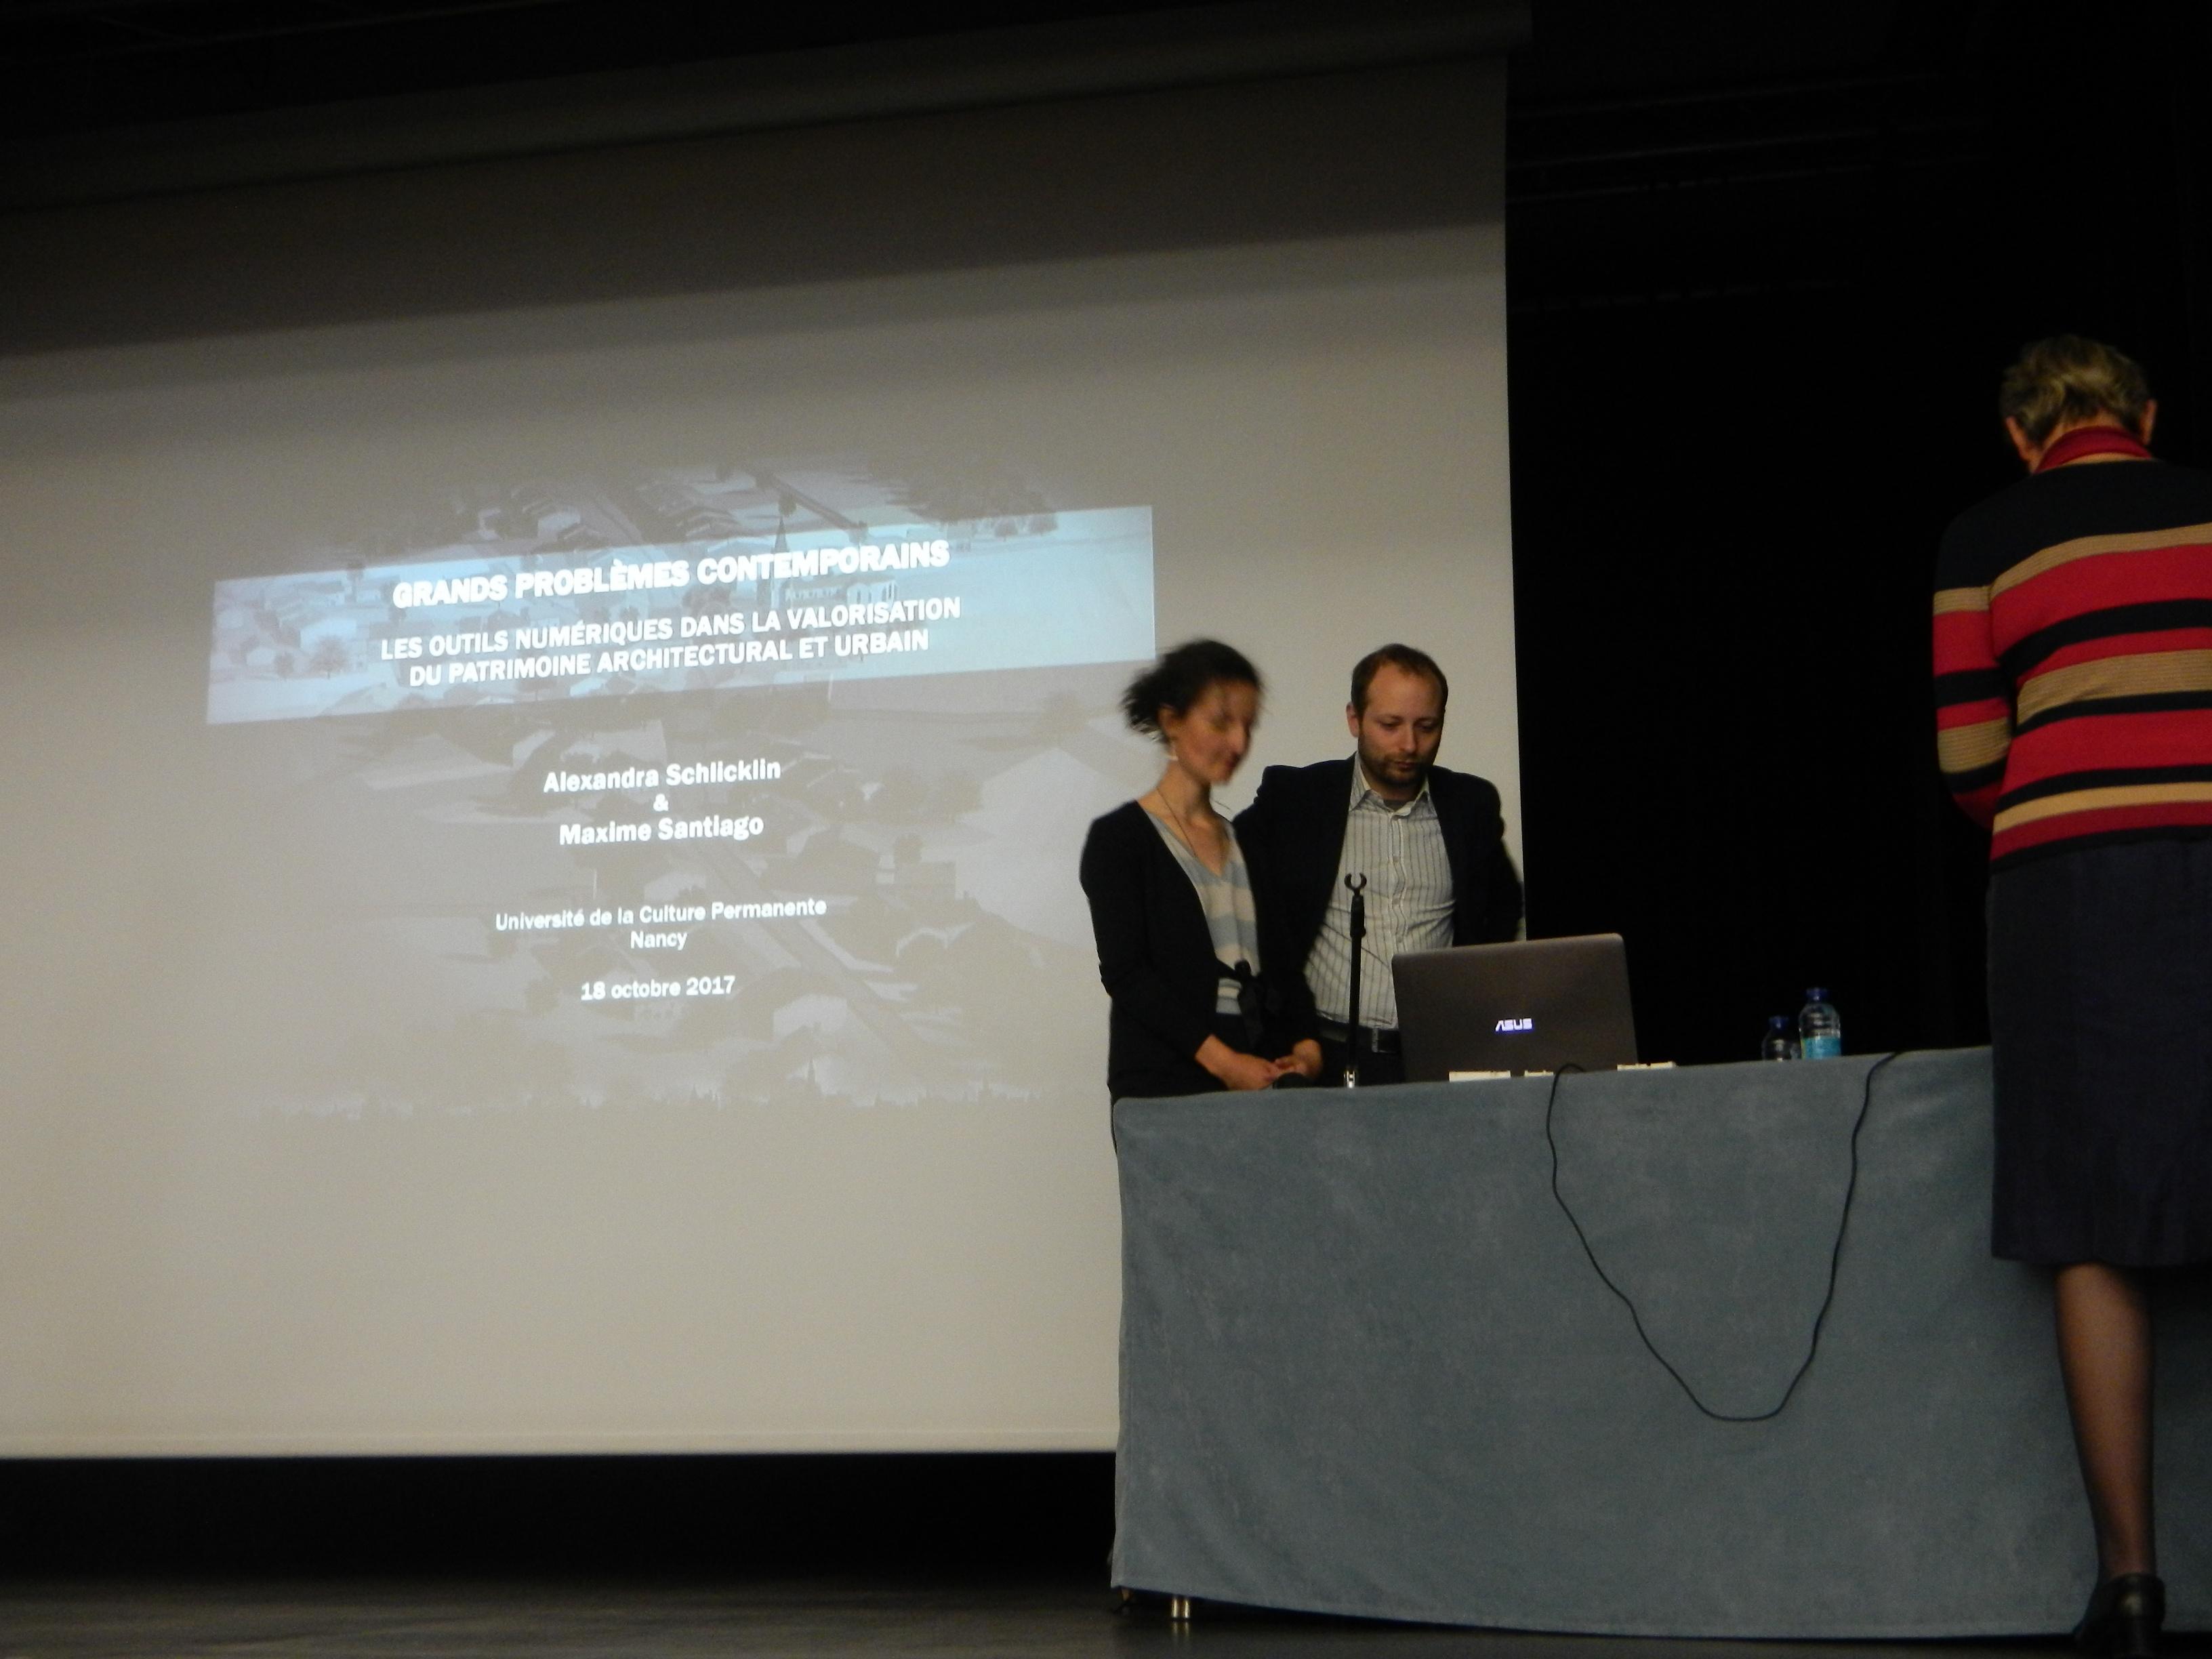 conference alexandra schicklin 01